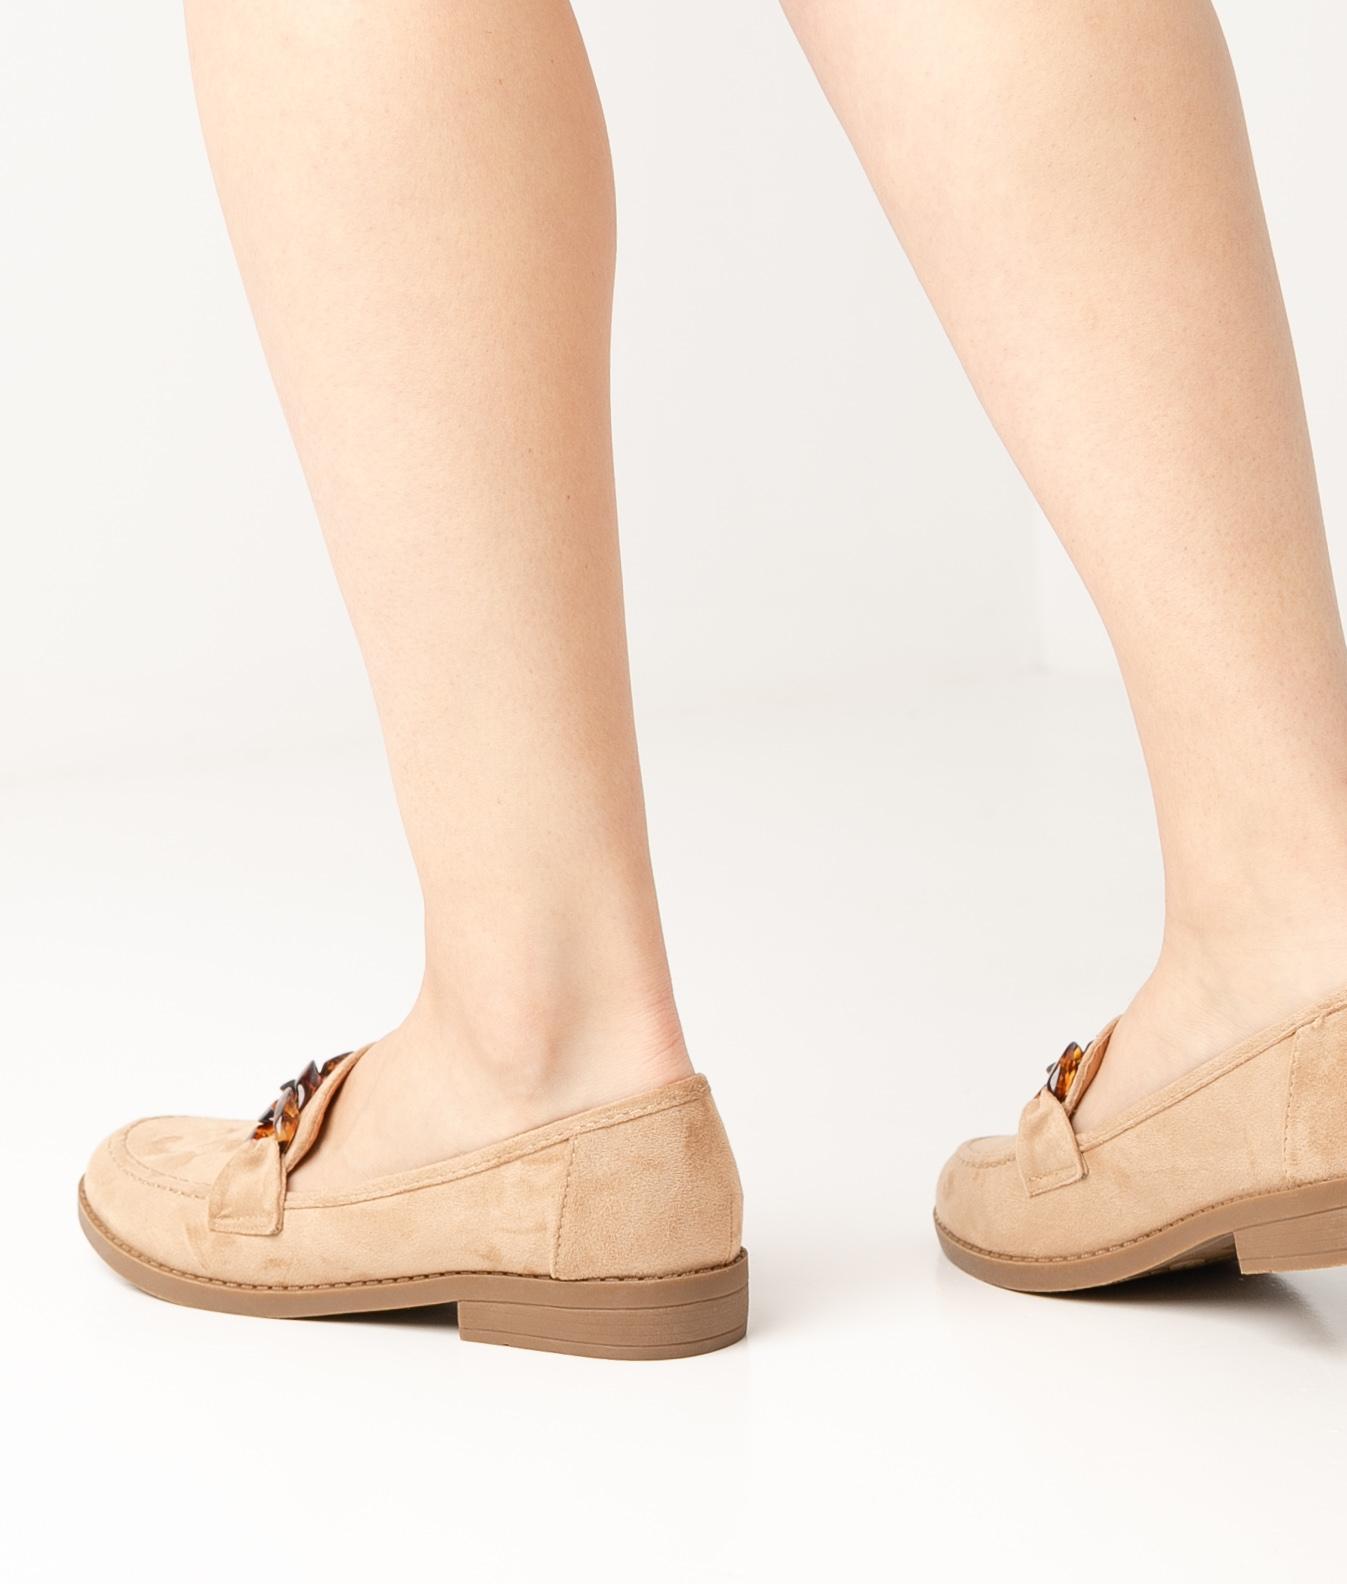 Shoes VARNA - BEIGE